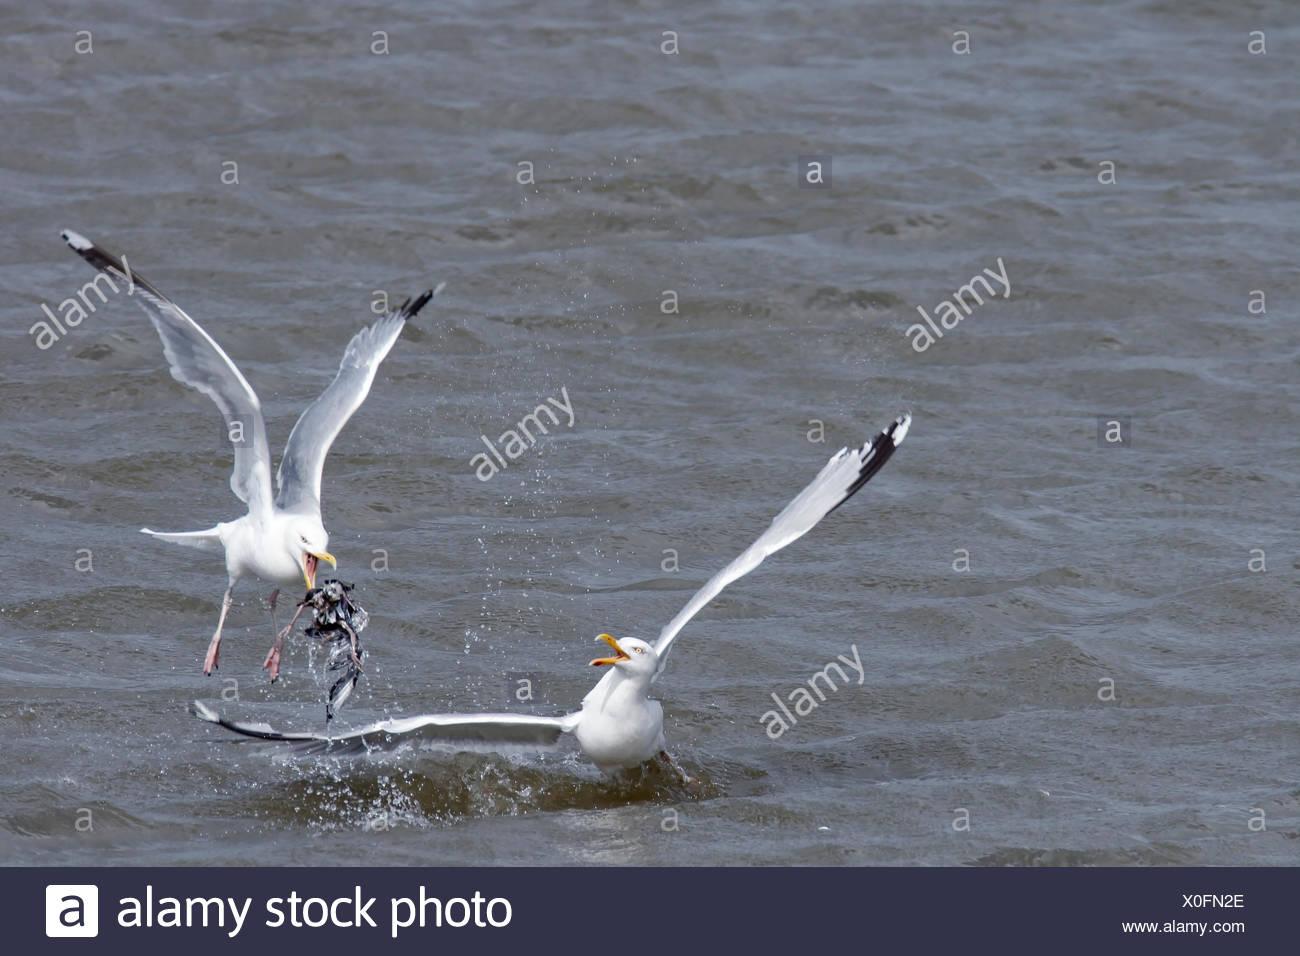 European Herring Gulls (Larus argentatus) fighting over food, Minsener Oog island, East Frisian Islands, Lower Saxony Wadden Sea - Stock Image